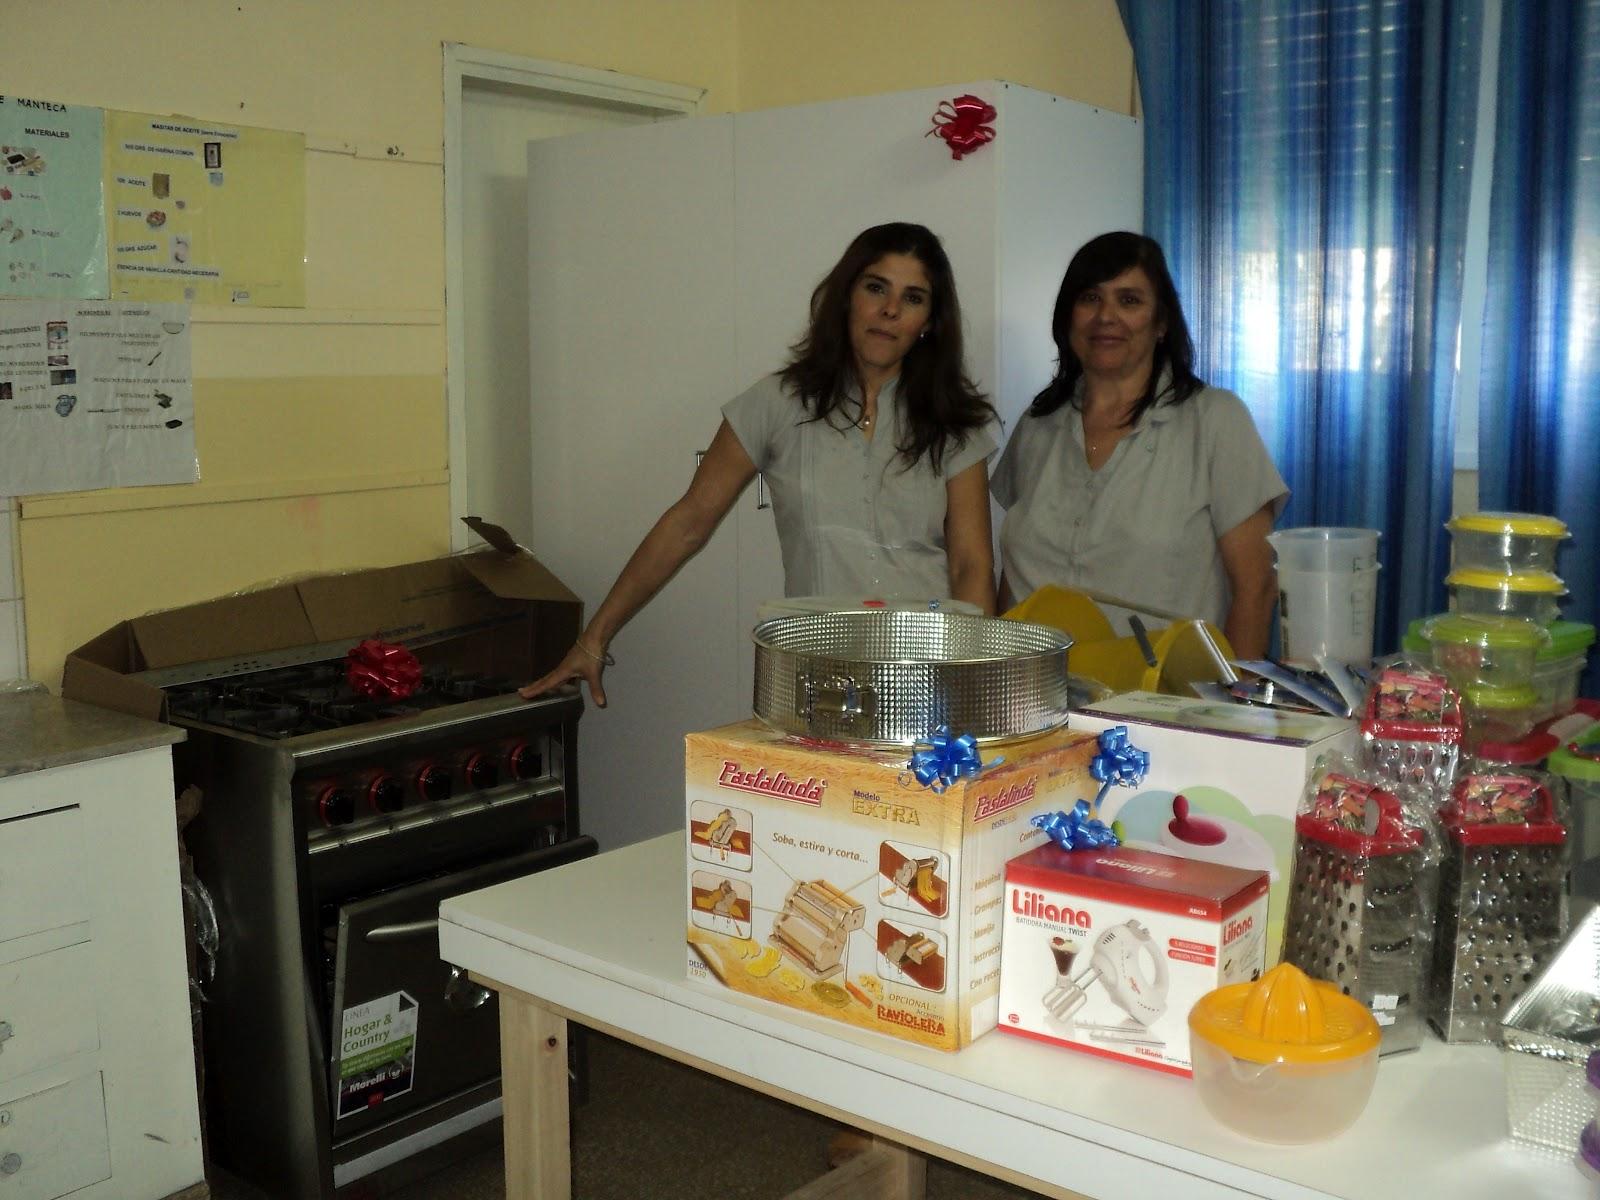 Canea casa del ni o for Carrefour utensilios cocina